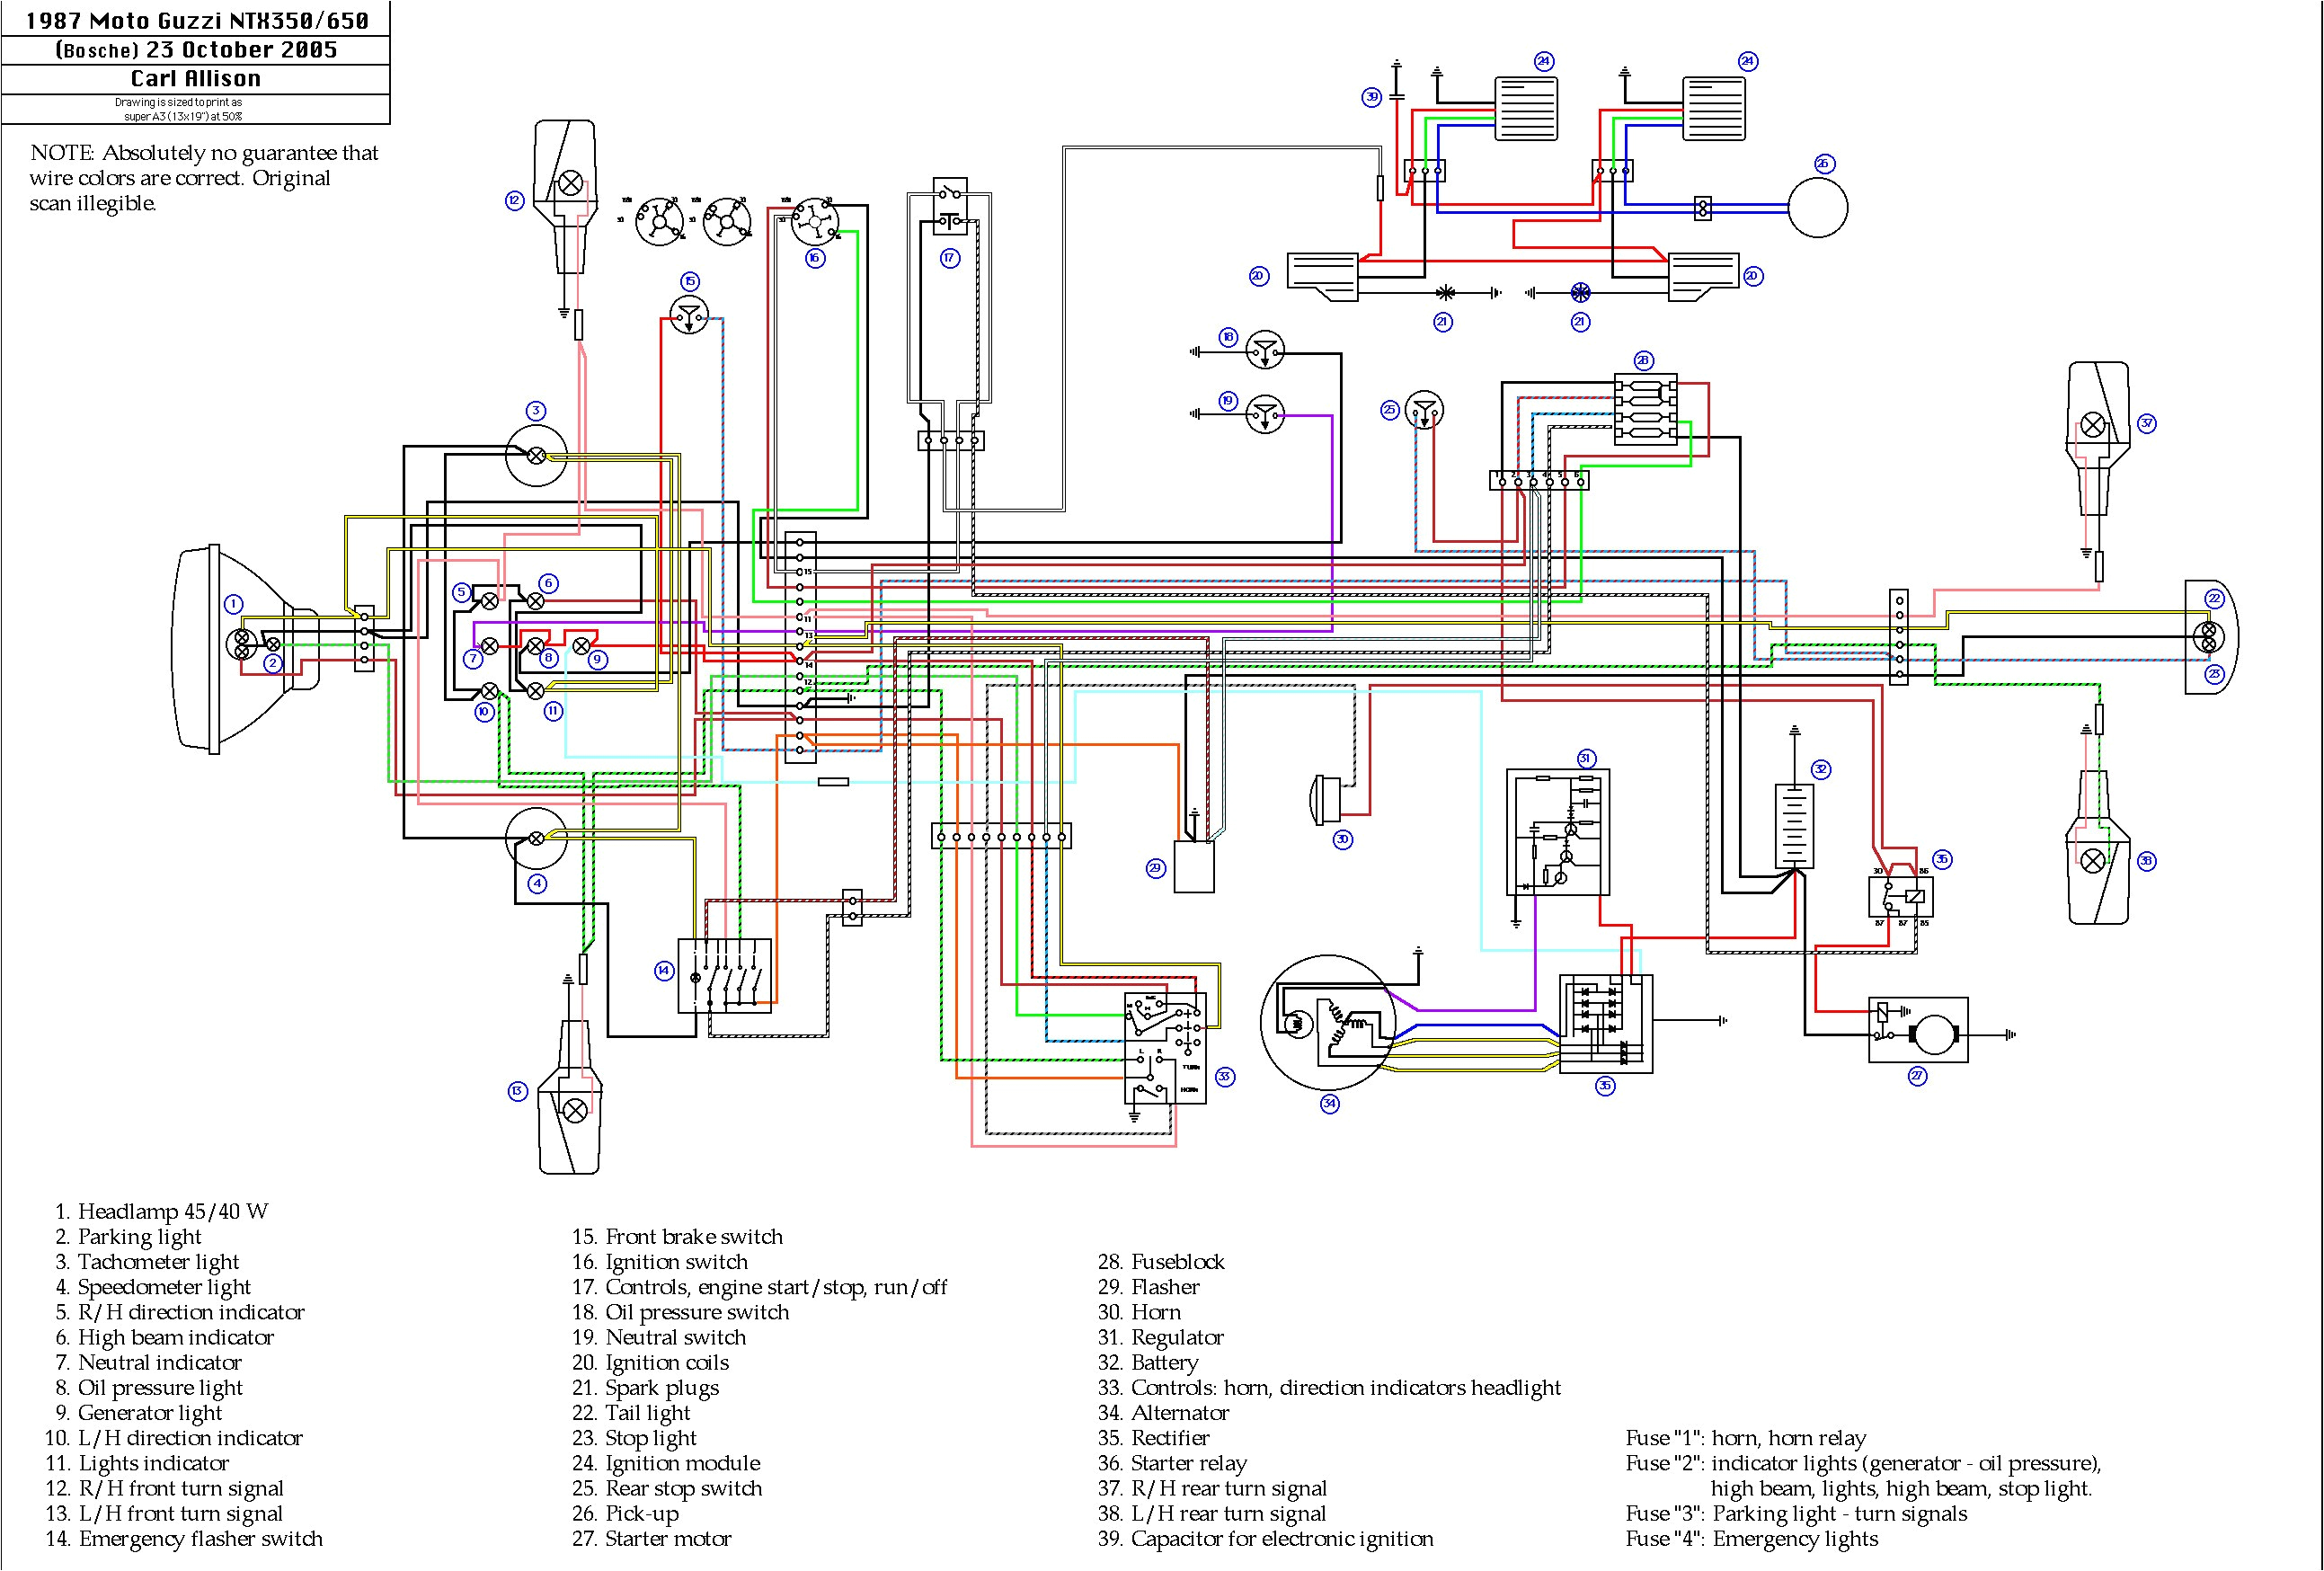 yamaha vmax wiring diagram wiring diagram page mix vmax wiring diagram blog wiring diagram 1995 yamaha